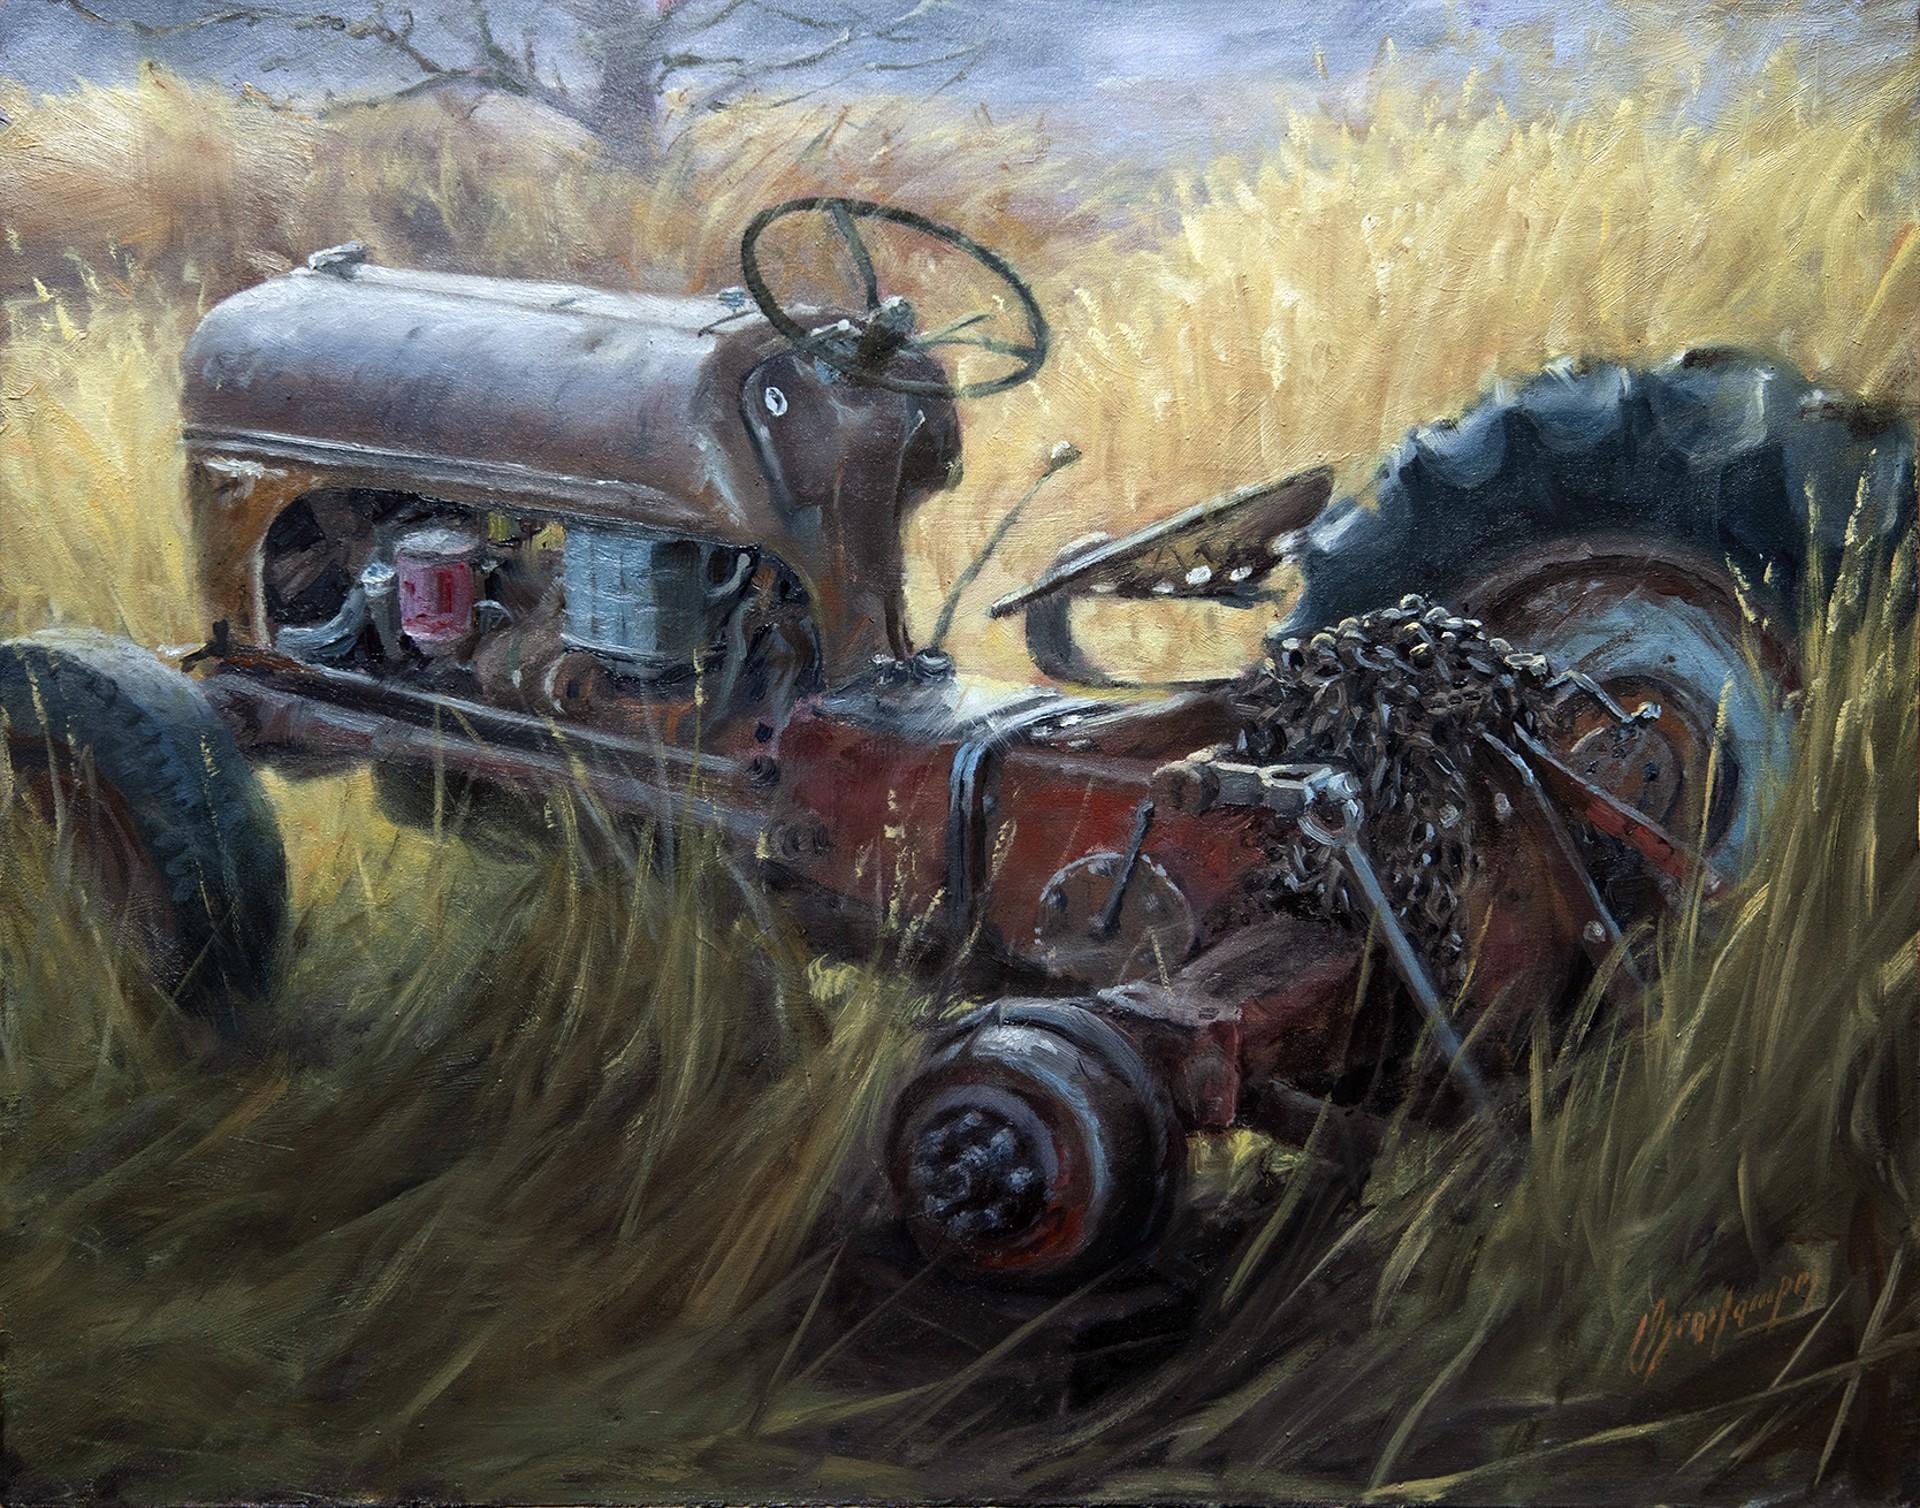 On a Long Break by Oscar Campos